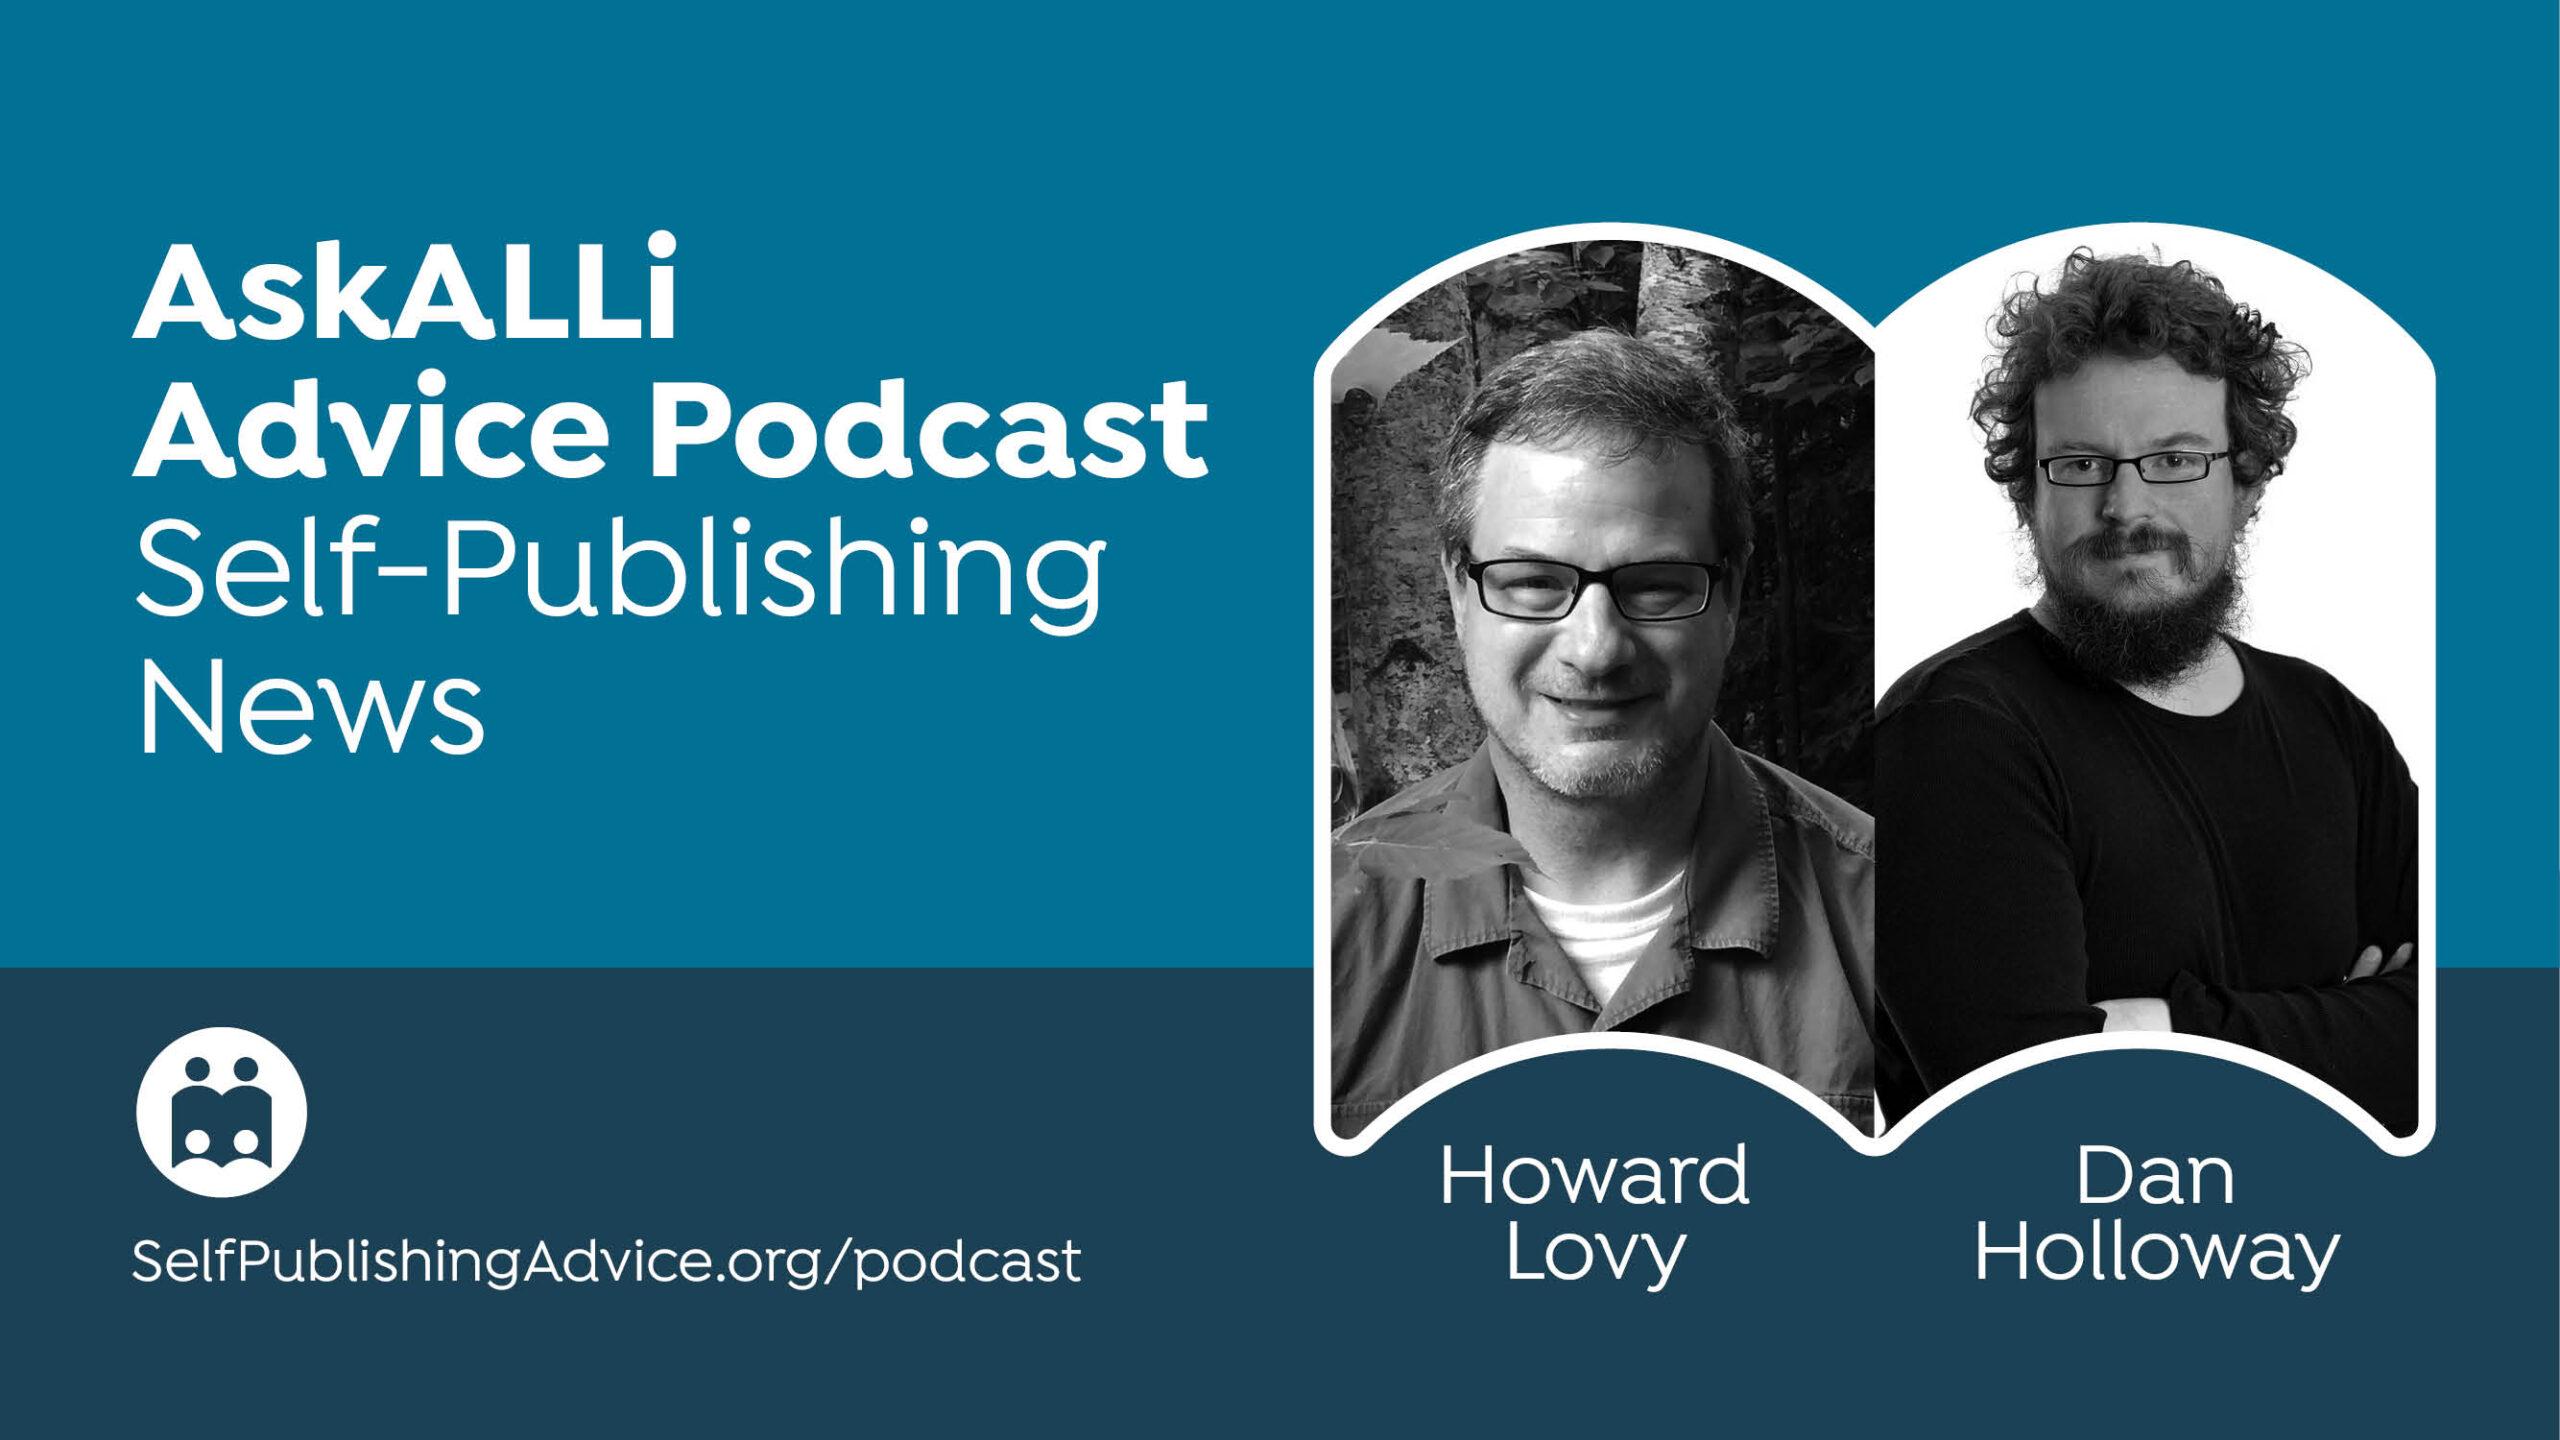 PODCAST: Self-Publishing News